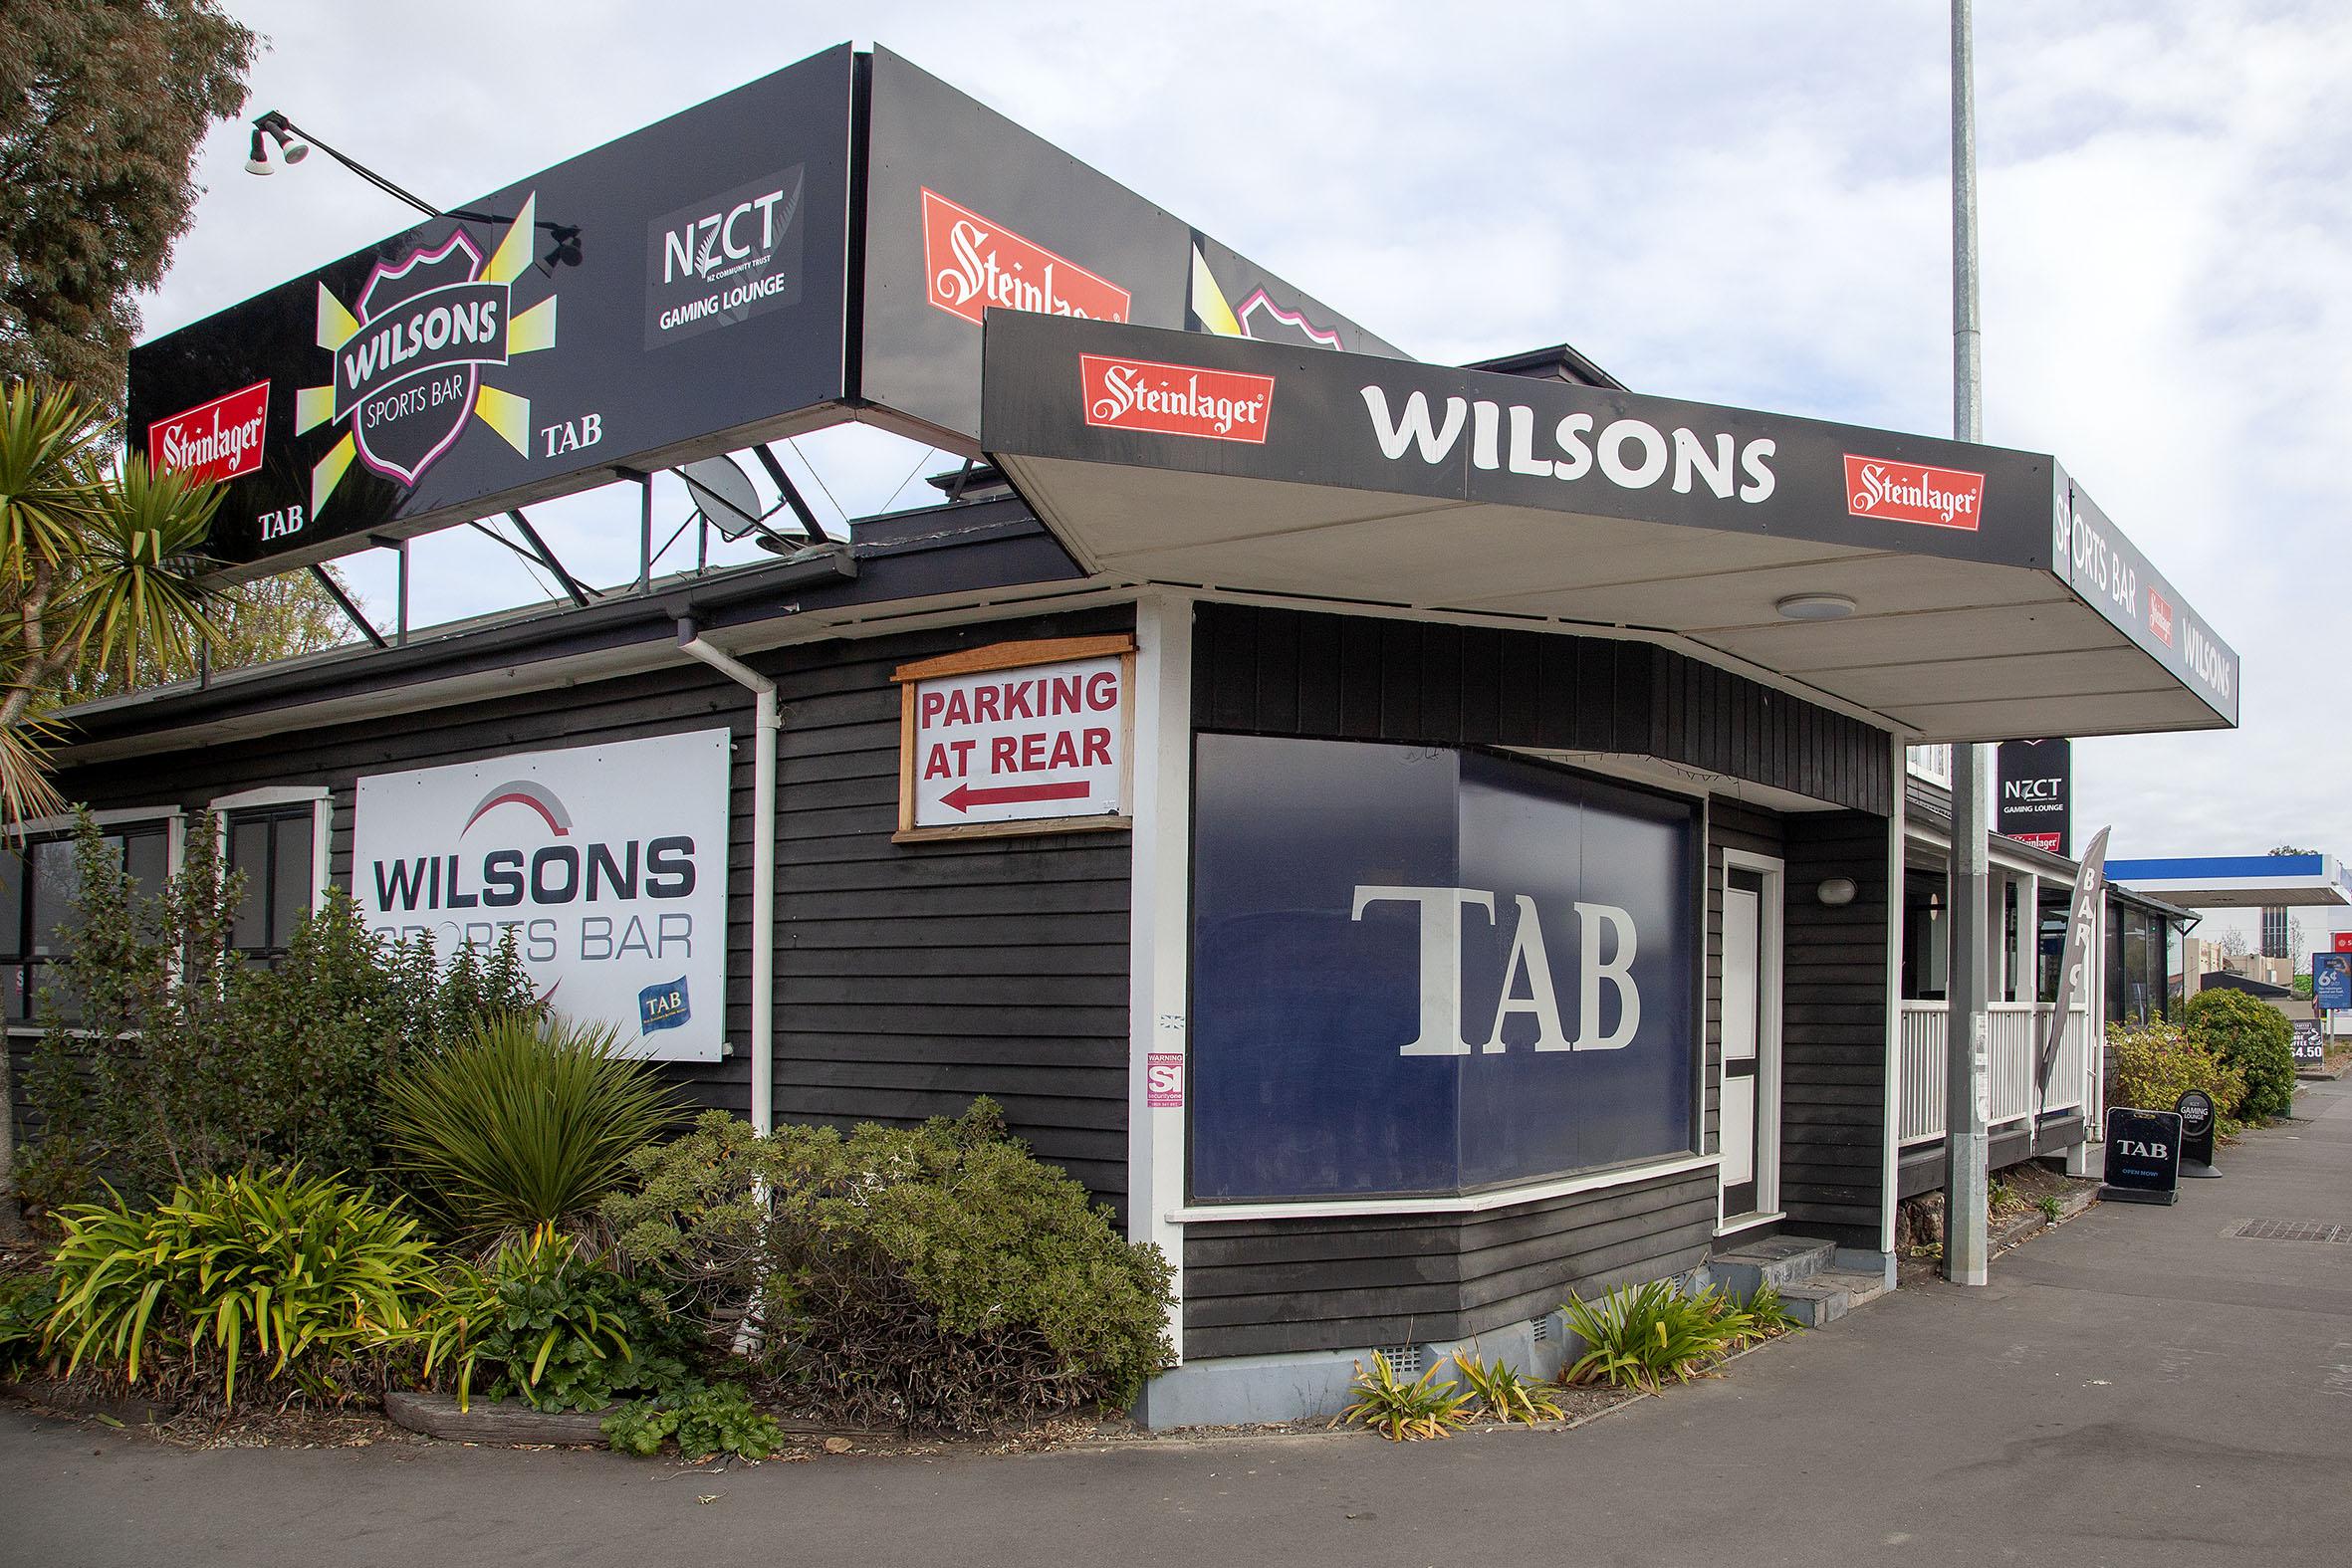 Wilsons Sports Bar on Riccarton Rd. Photo: Geoff Sloan